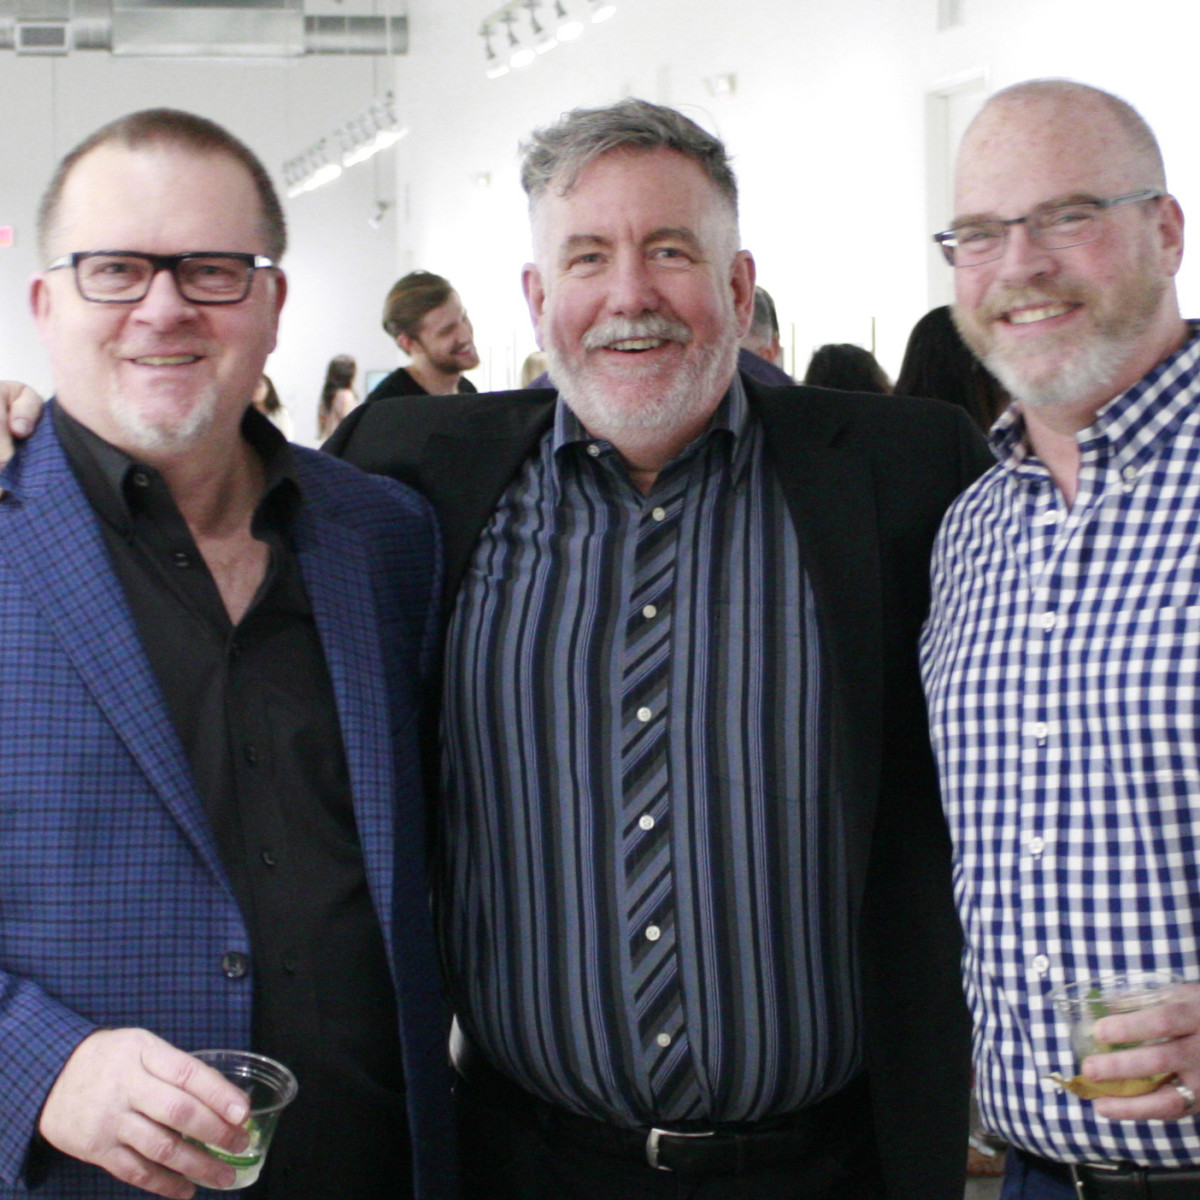 FotoFest Opening Reception David Klonkowski, Steven Evans, George Toland